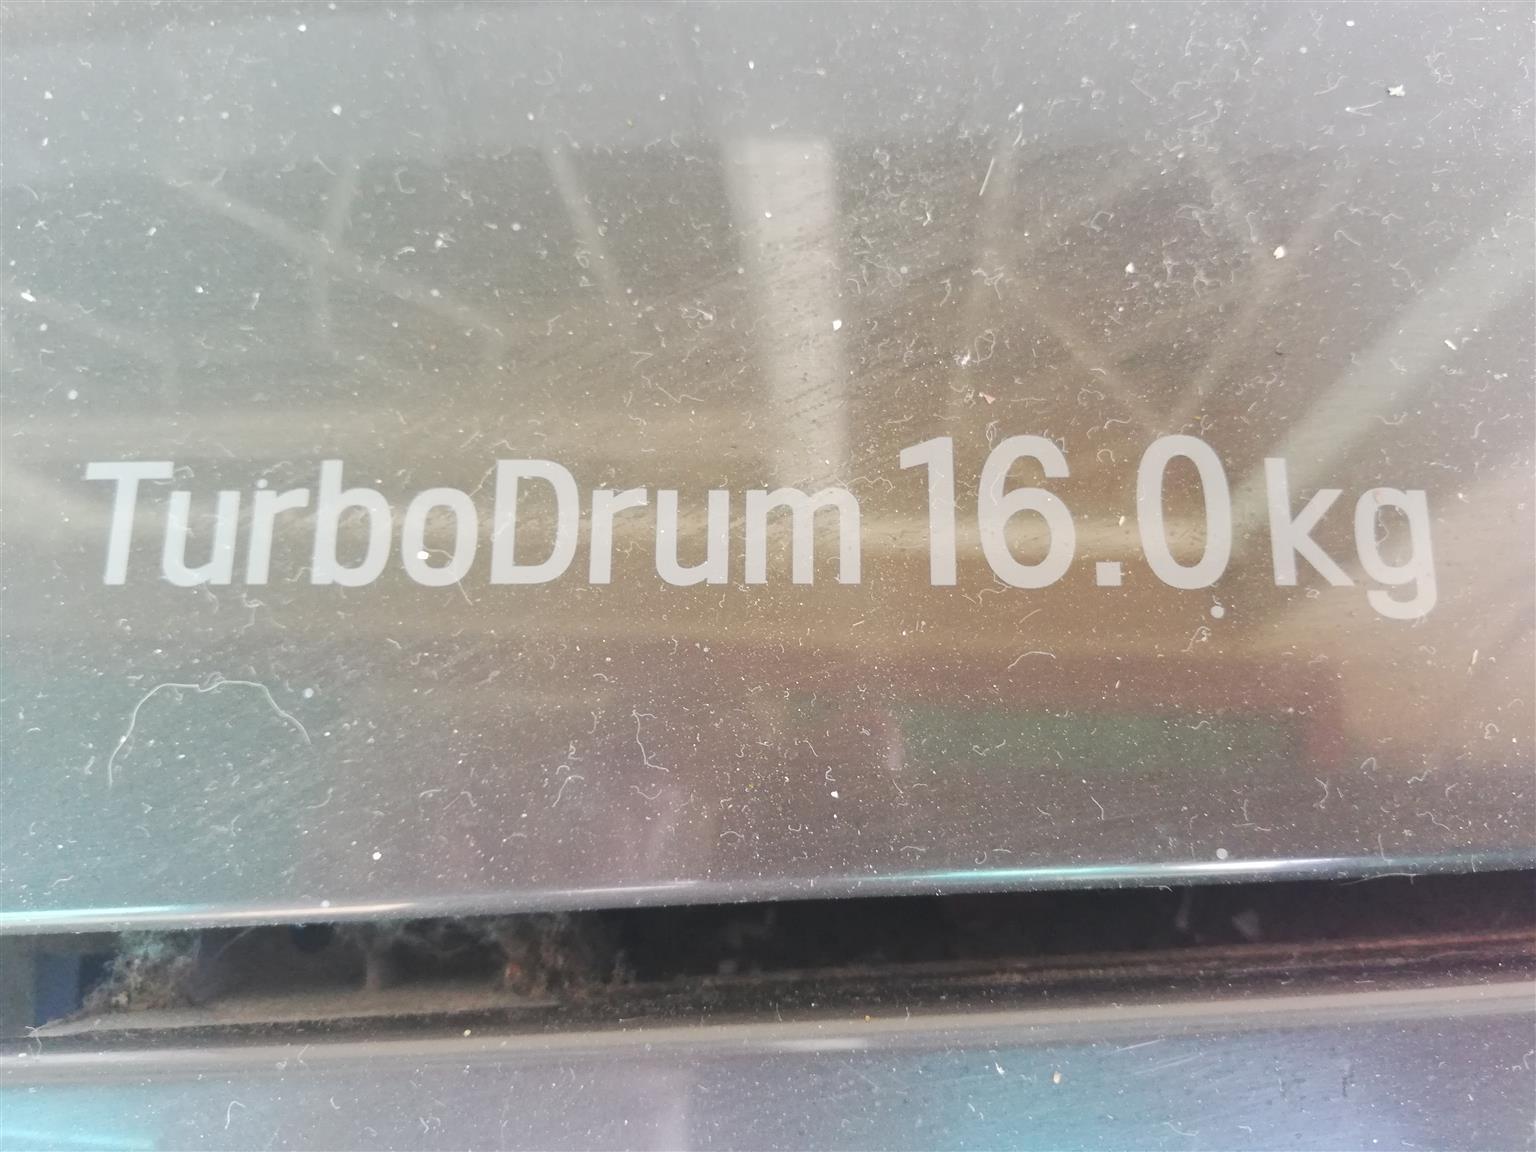 LG 16kg turbo drum washing machine